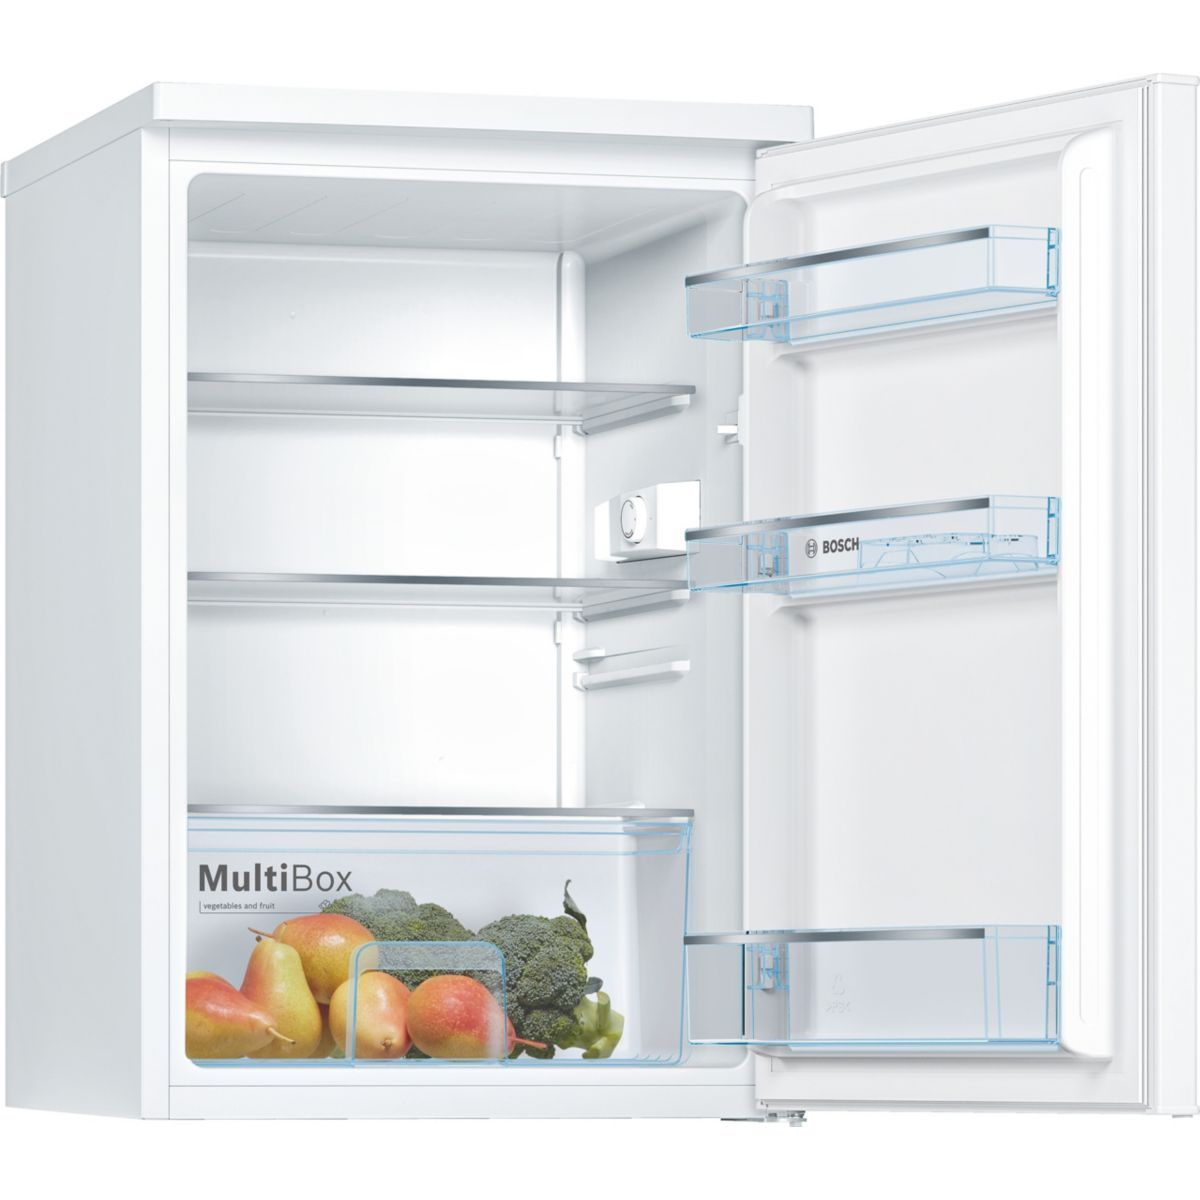 Refrigerateur Sous Plan Ktr15nw3a Taille Taille Unique Refrigerateur Sous Plan Refrigerateur Top Et Bosch